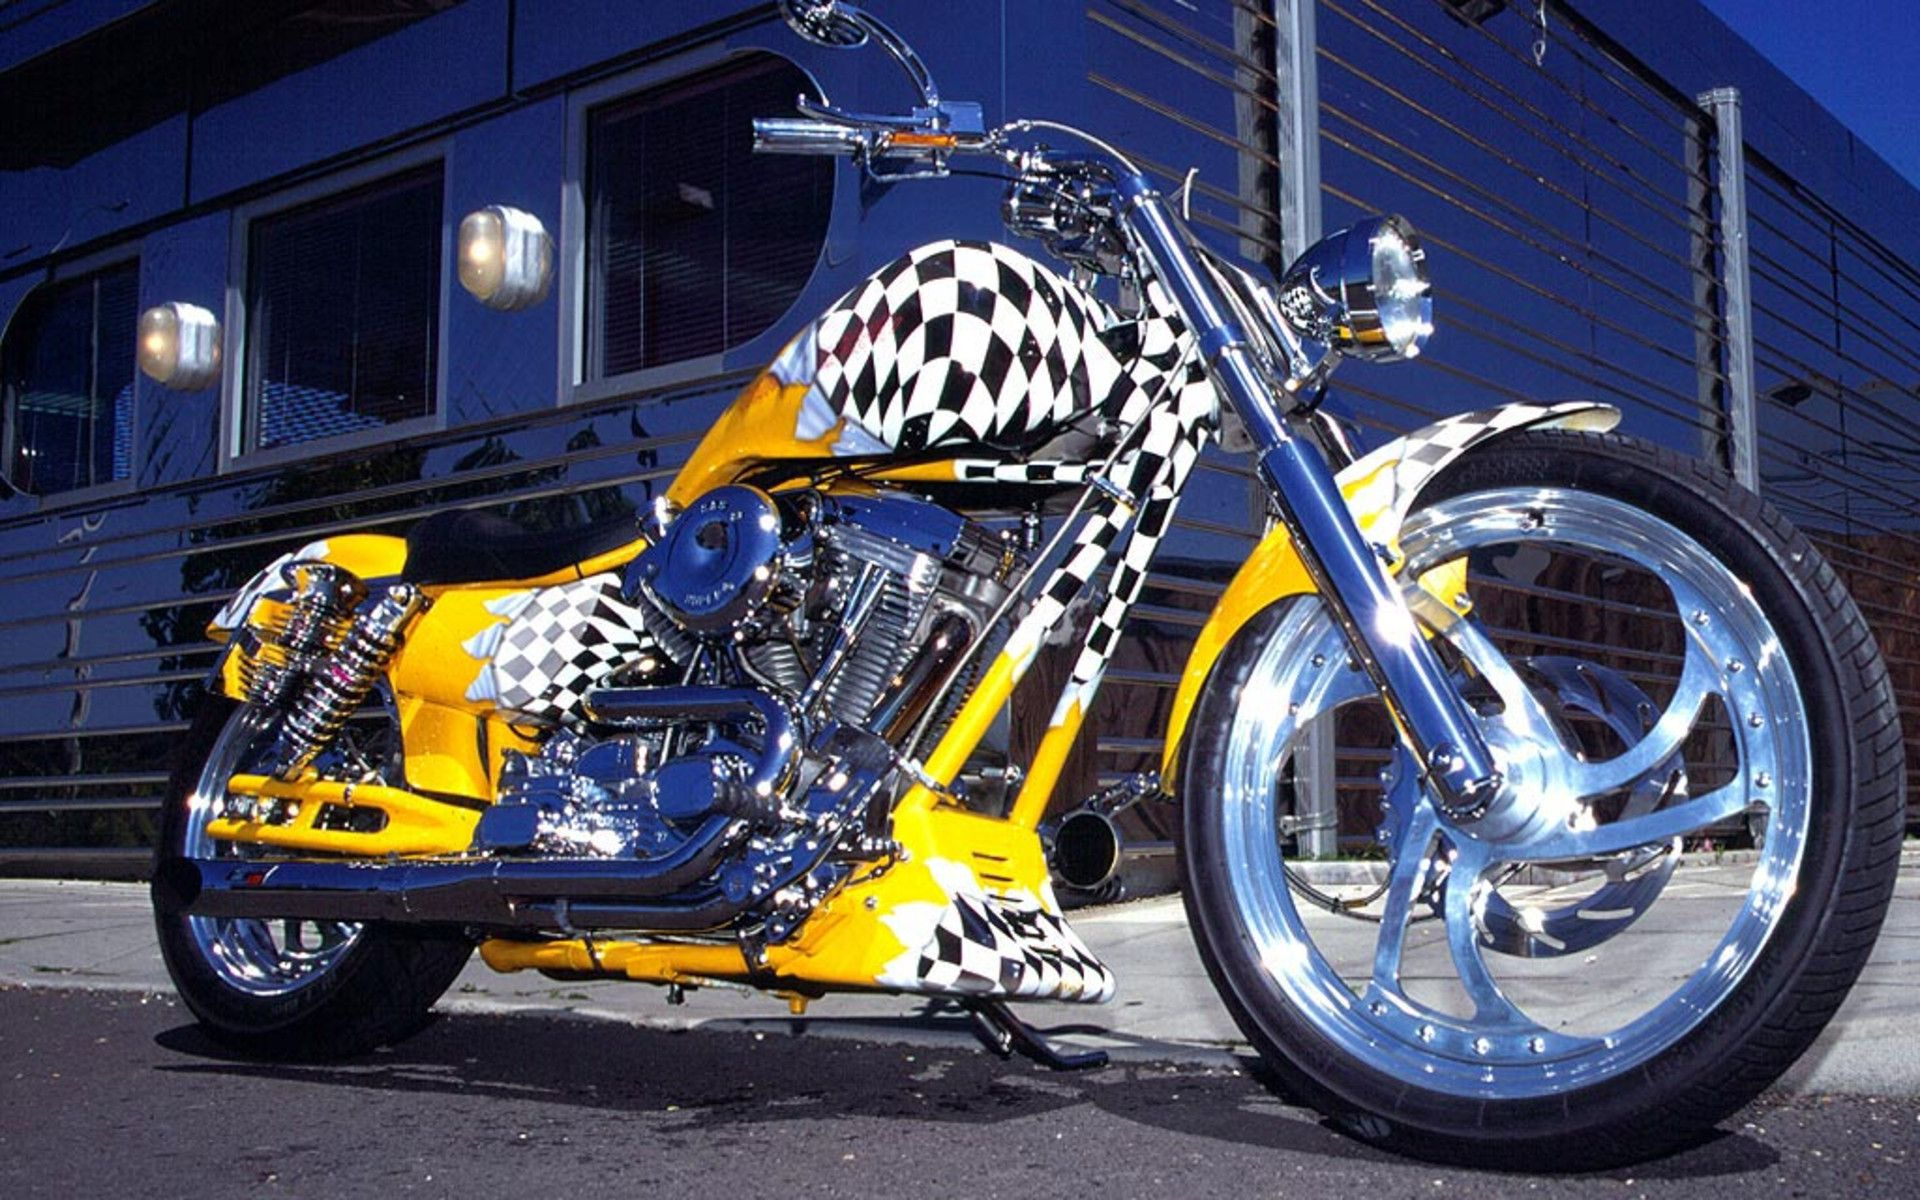 Wallpaper Harley Davidson Motorcycles - WallpaperSafari